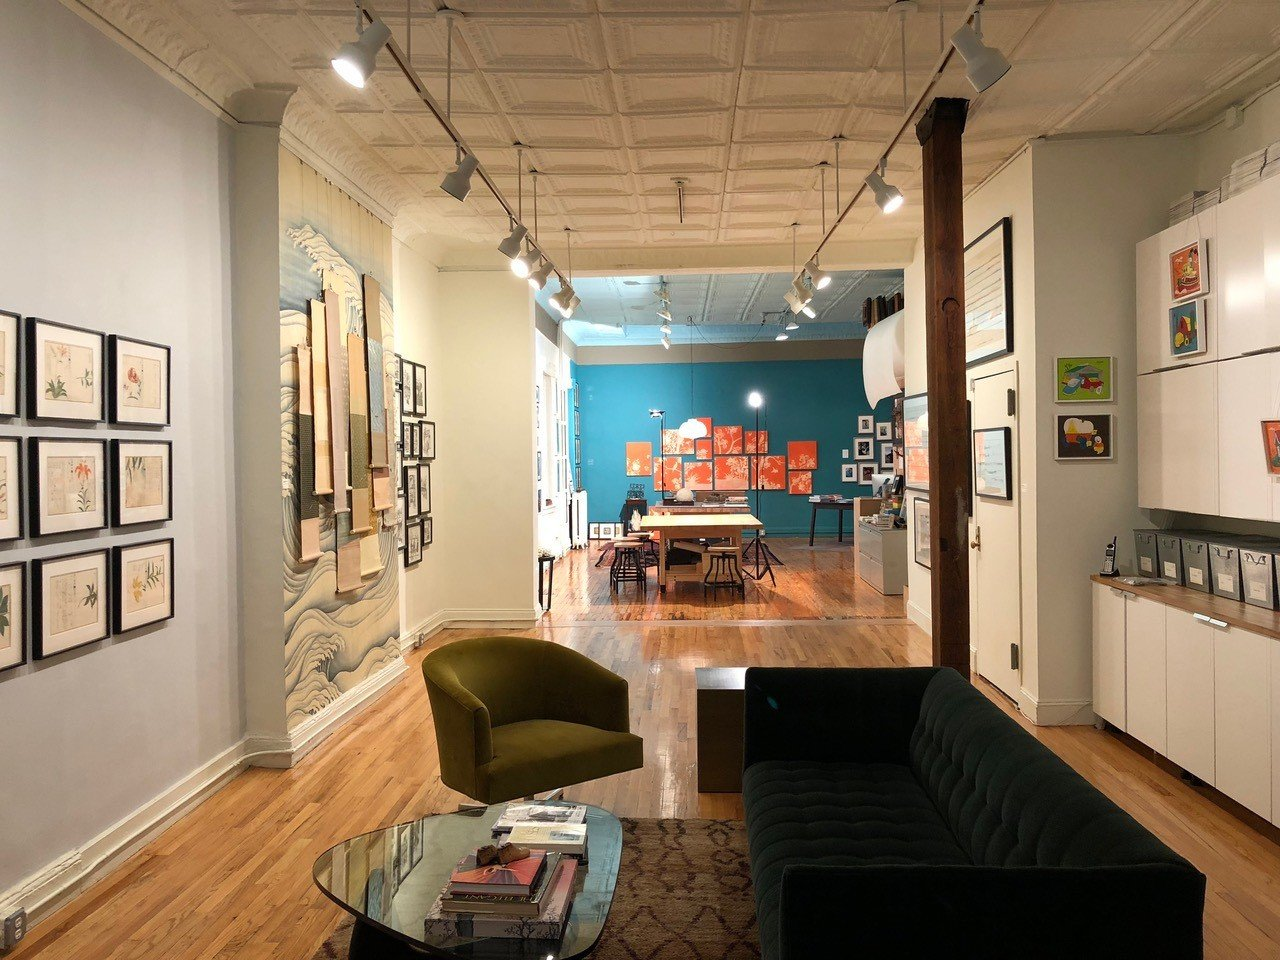 NYC  Gallery ILevel Studio image 0